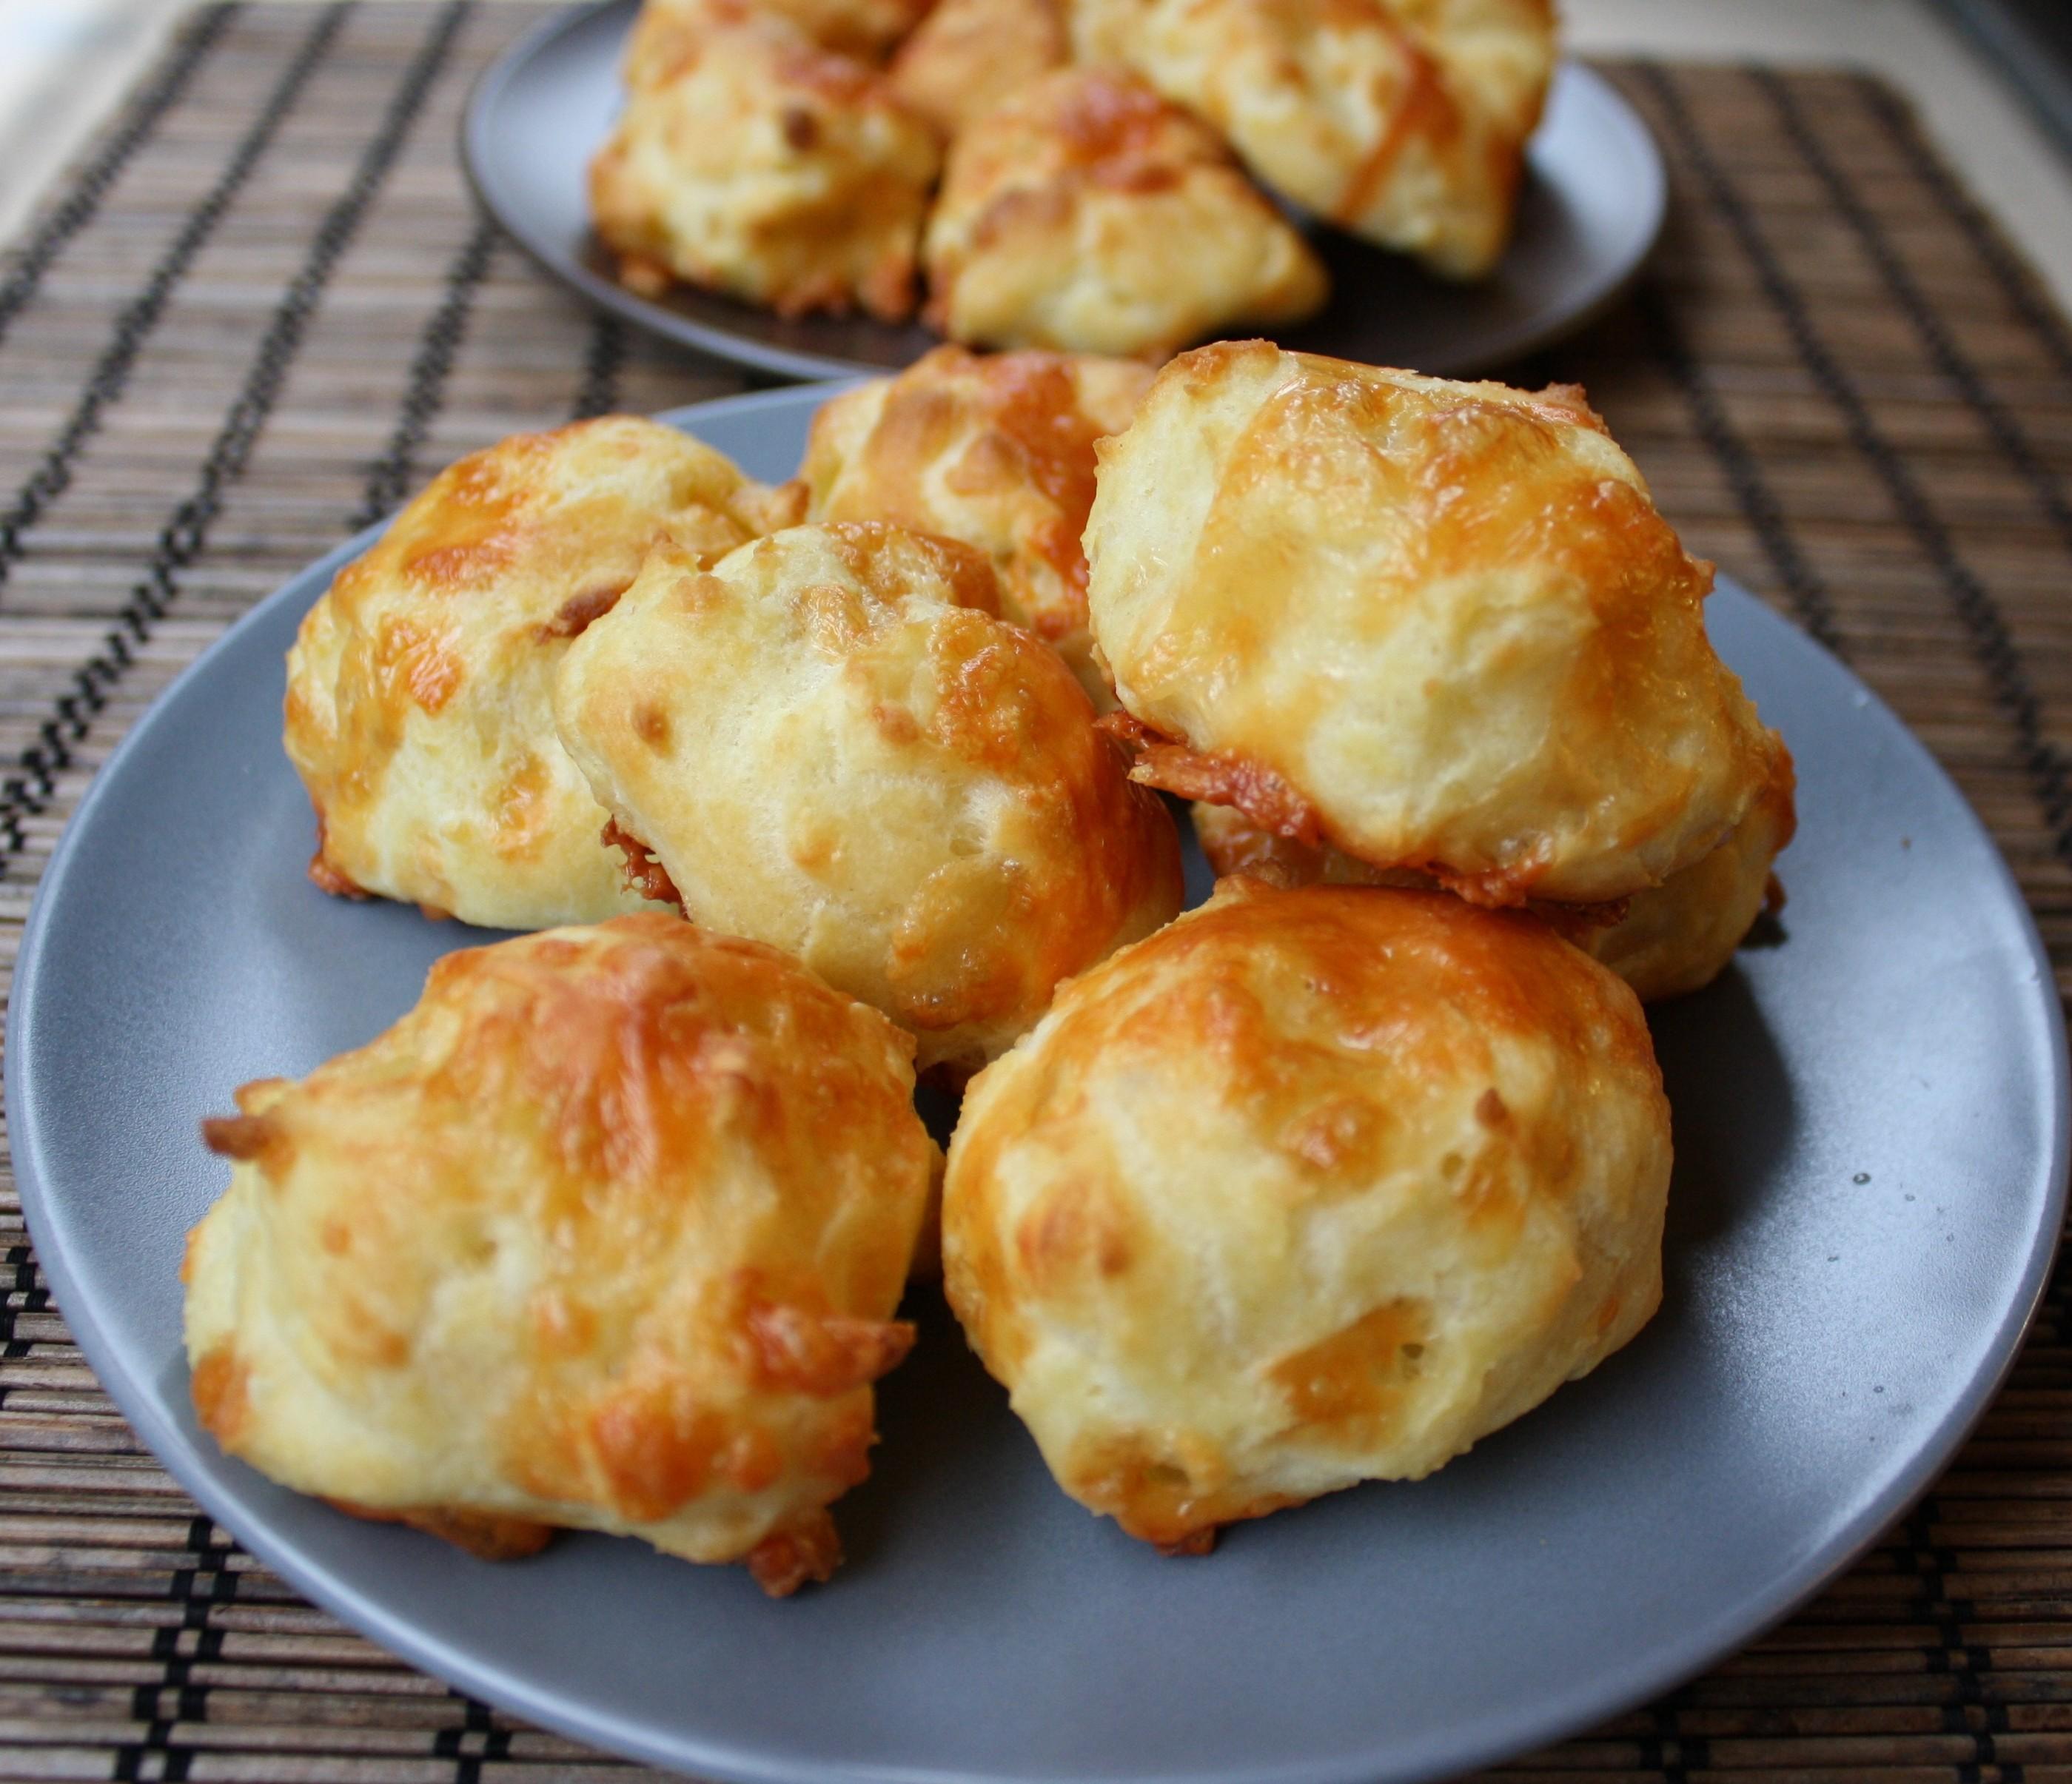 cheddar puffs i love harissa cheddar cheese puffs bacon cheddar cheese ...